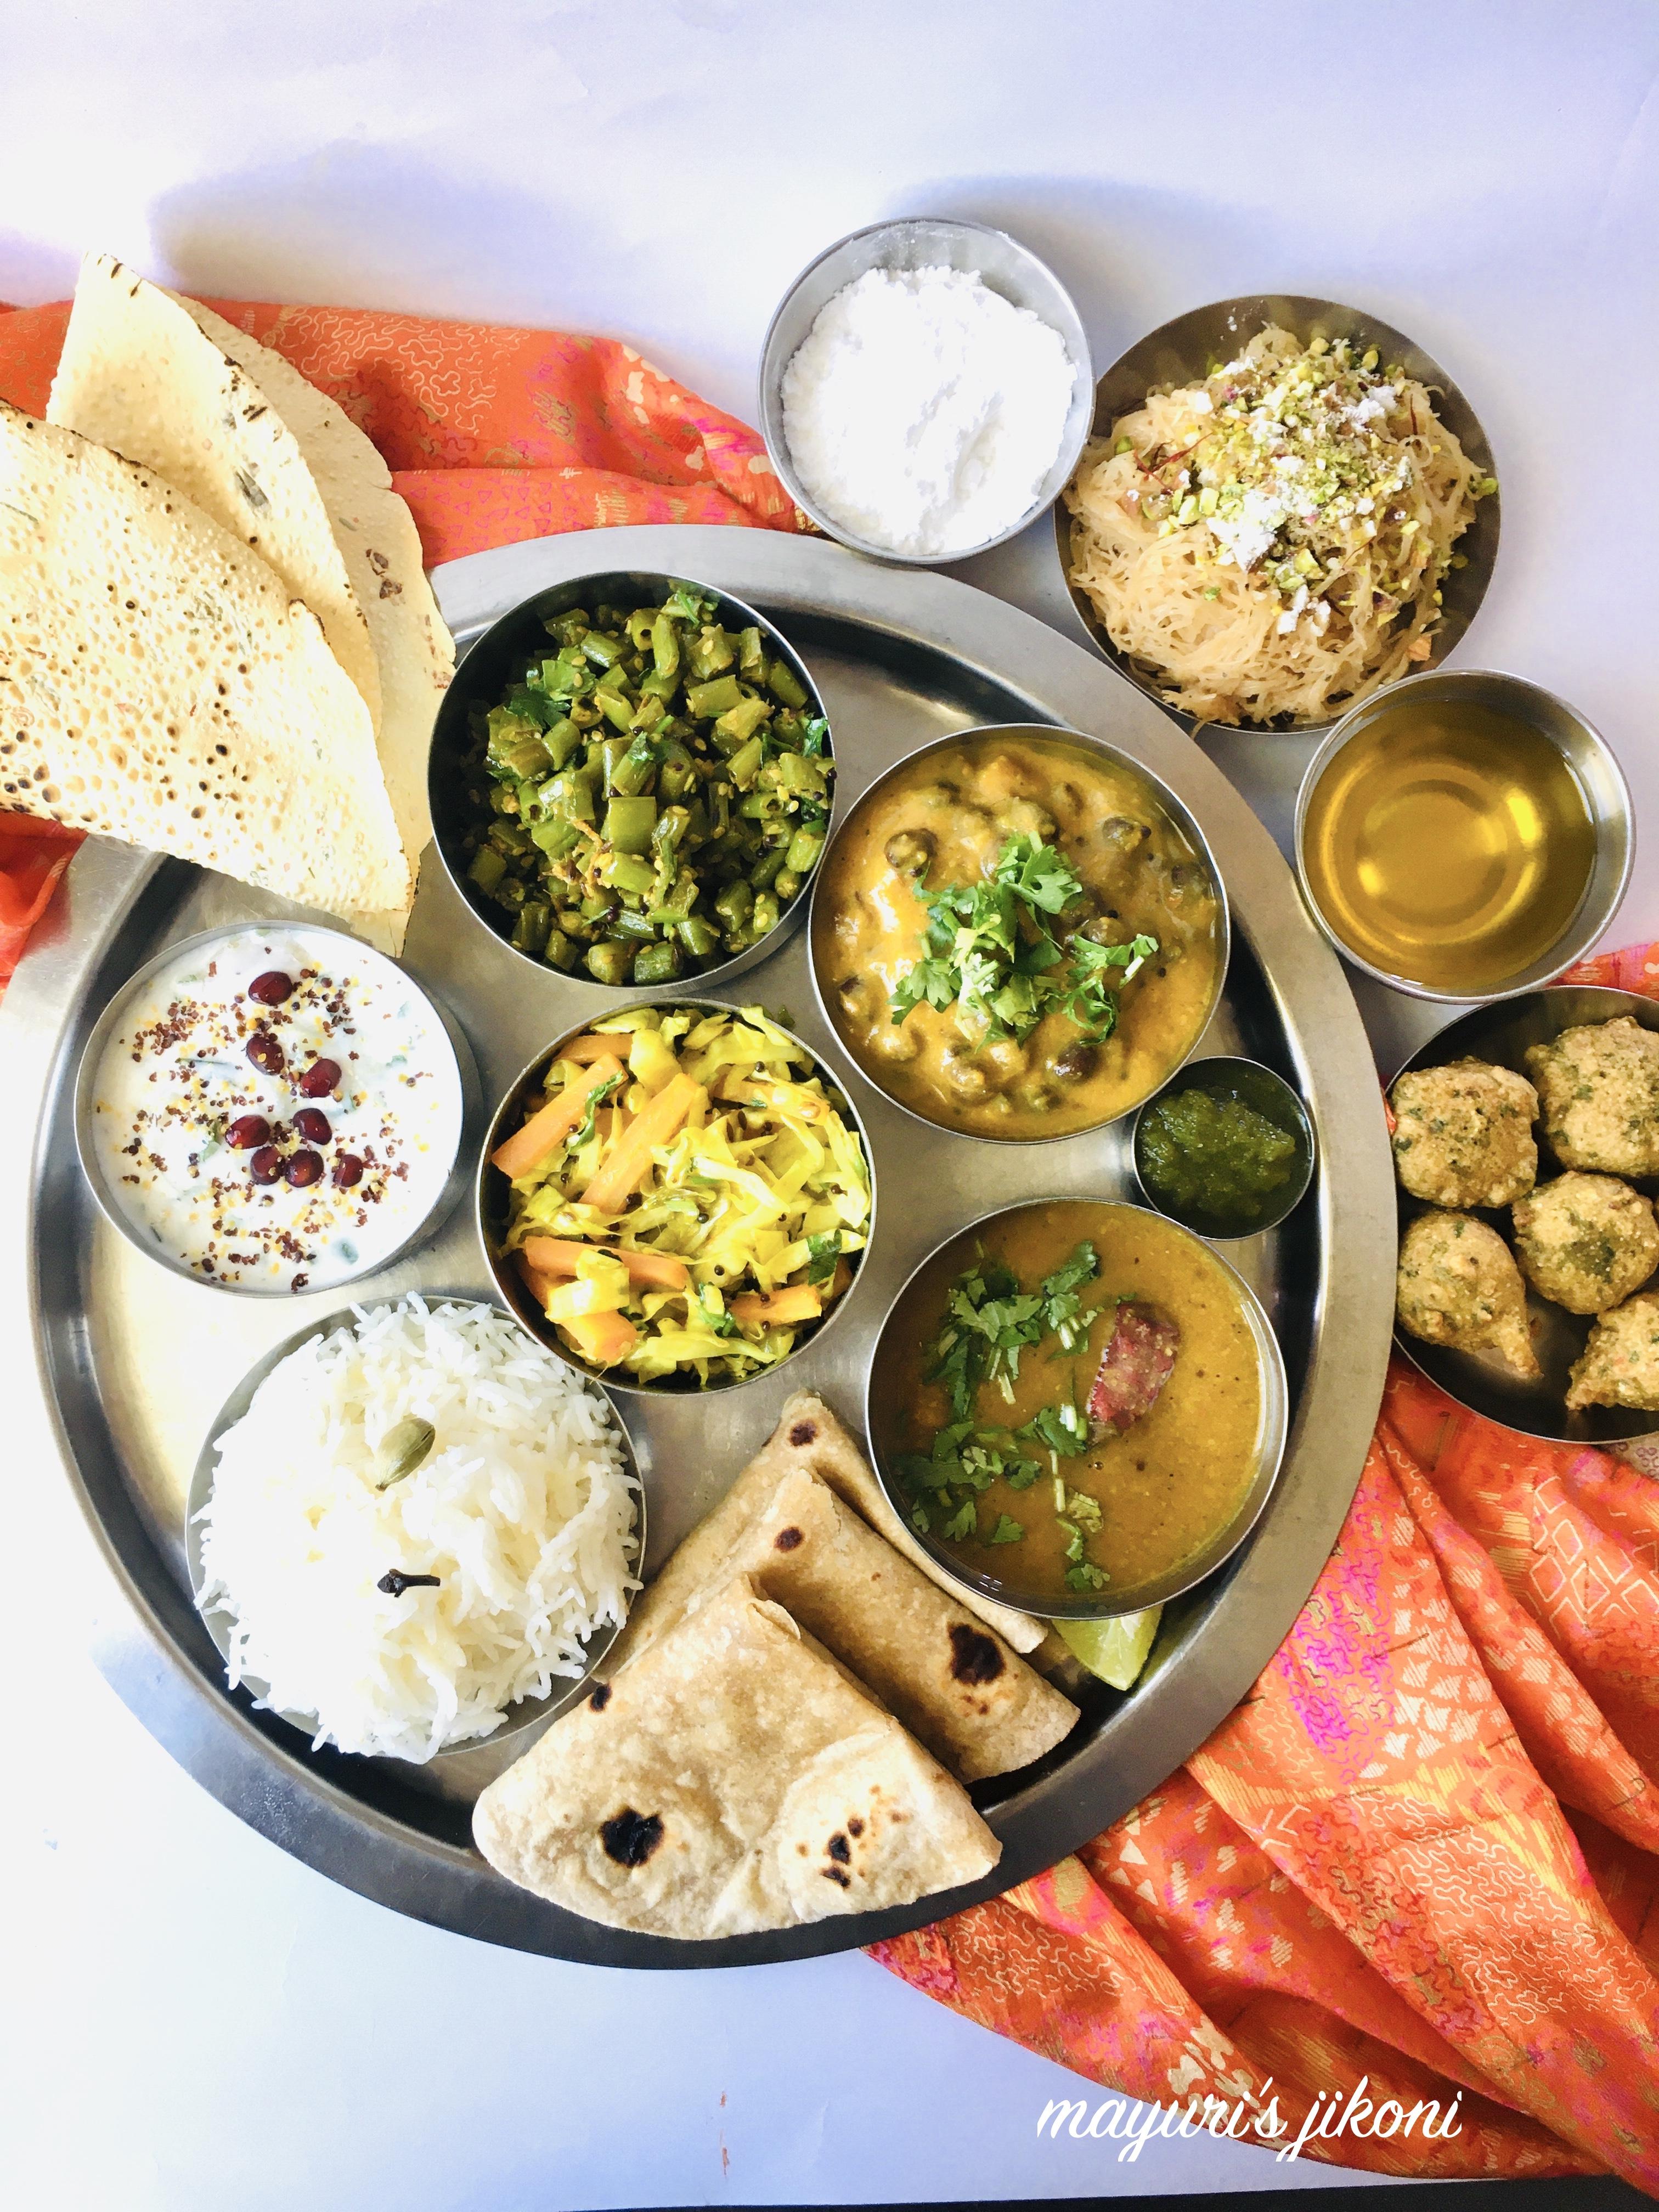 Gujarati Thali Methi Na Gota Mayuri S Jikoni Fresh Fenugreek Gujarati Cuisine Gujarati Snack Gujarati Thali Main Course Main Meal Methi Na Gota Satvik